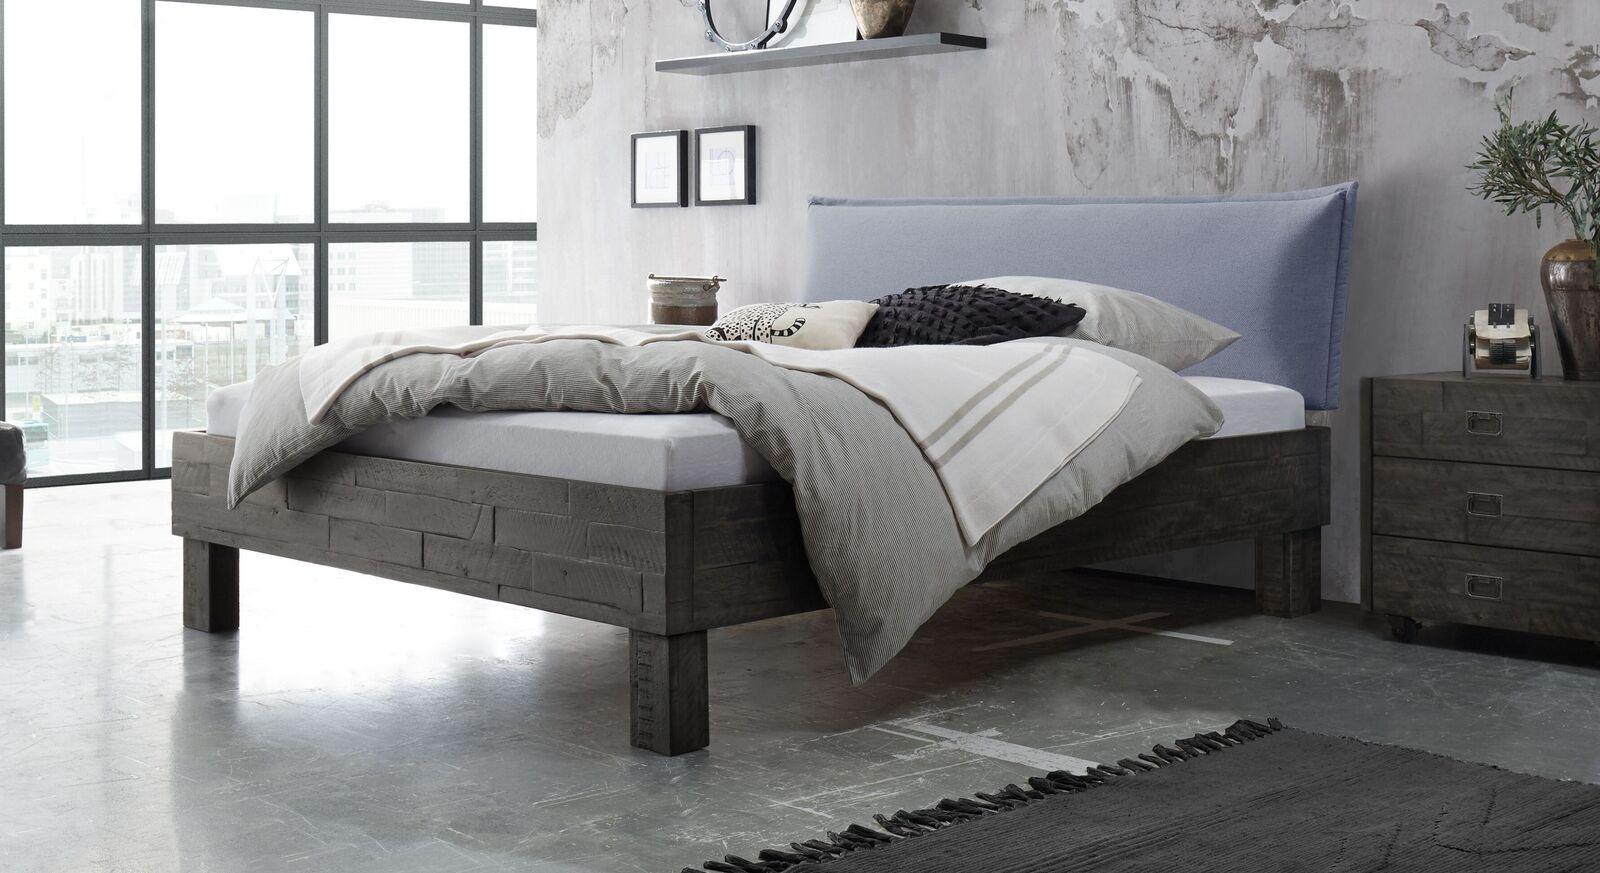 Bett Solidea aus Akazienholz mit hellblauem Kopfteil